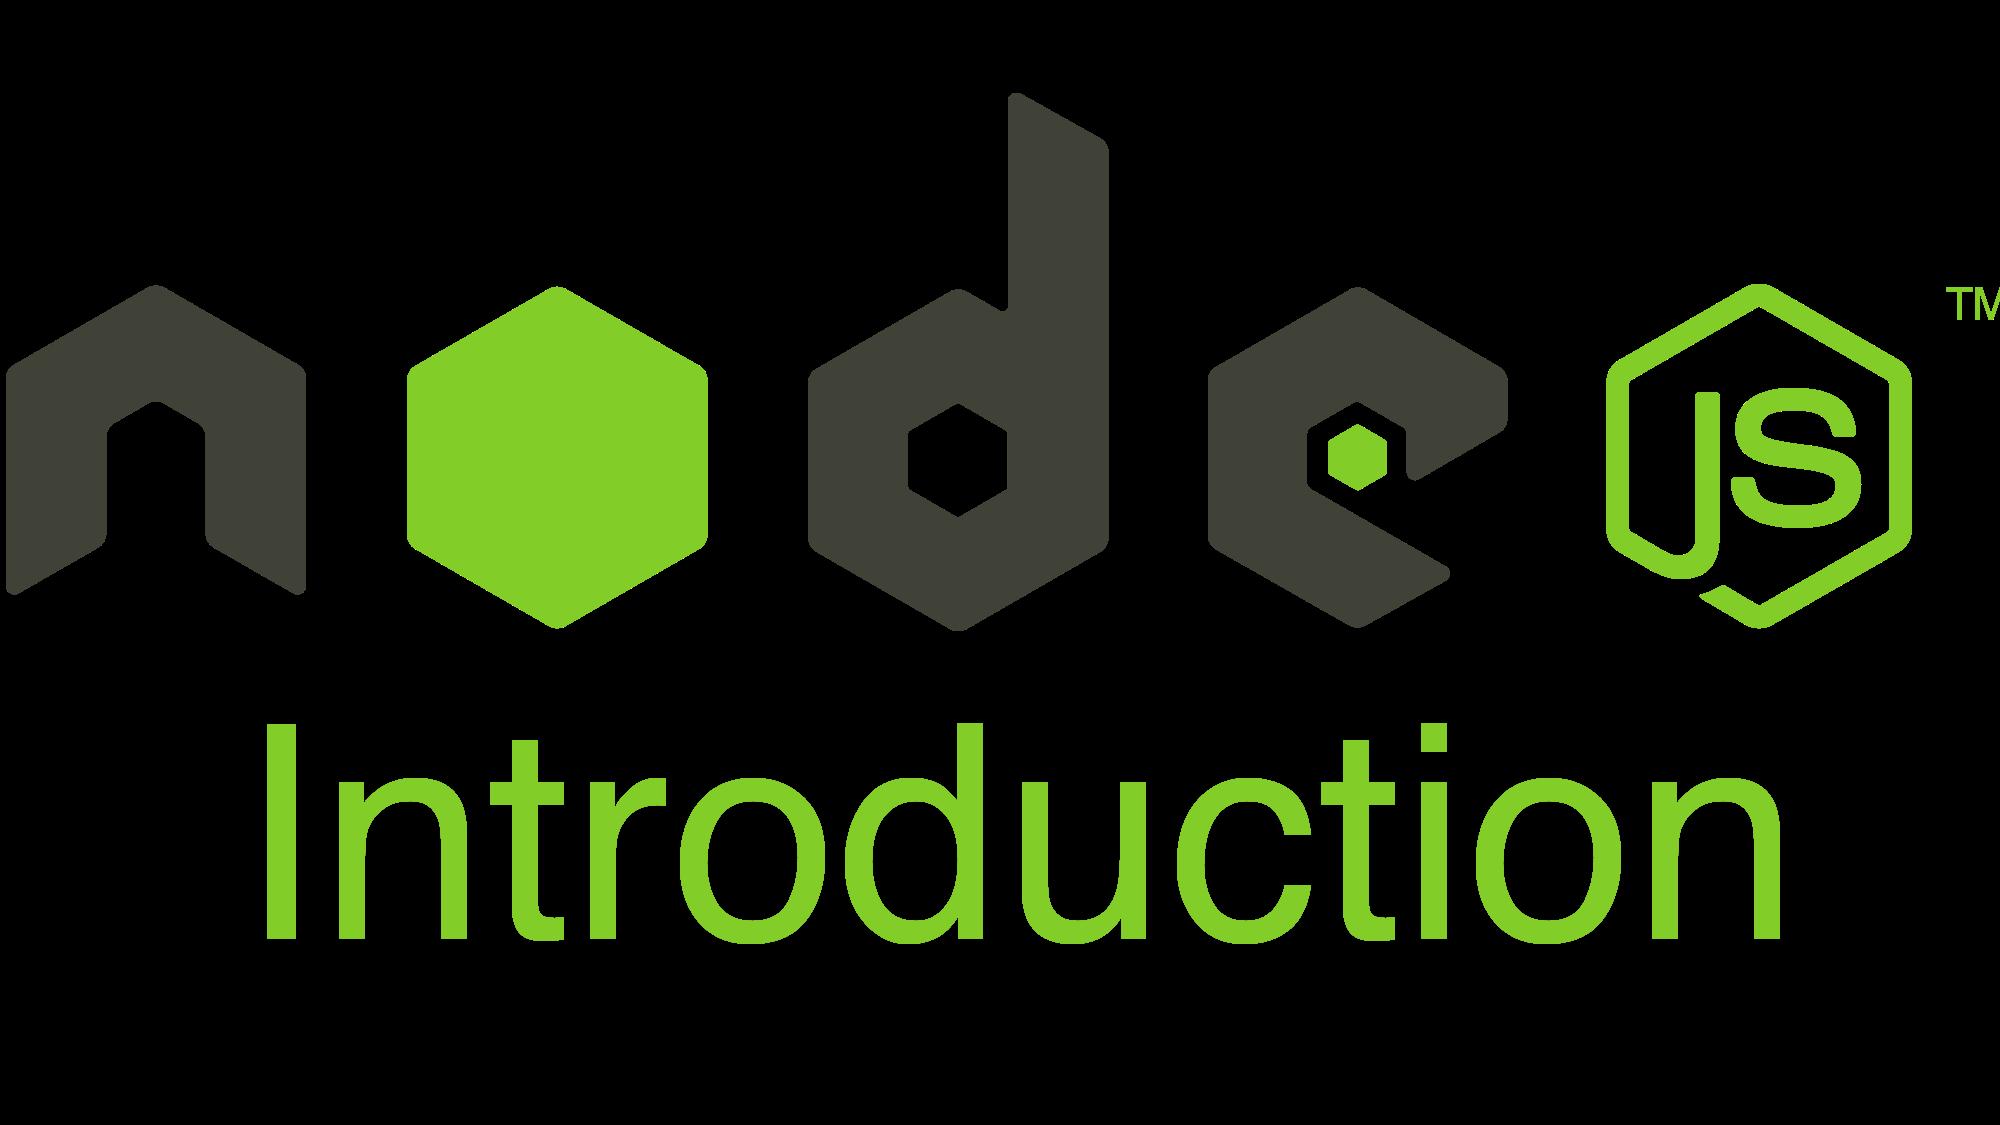 🔖 [Nodejs] Introduction to Nodejs